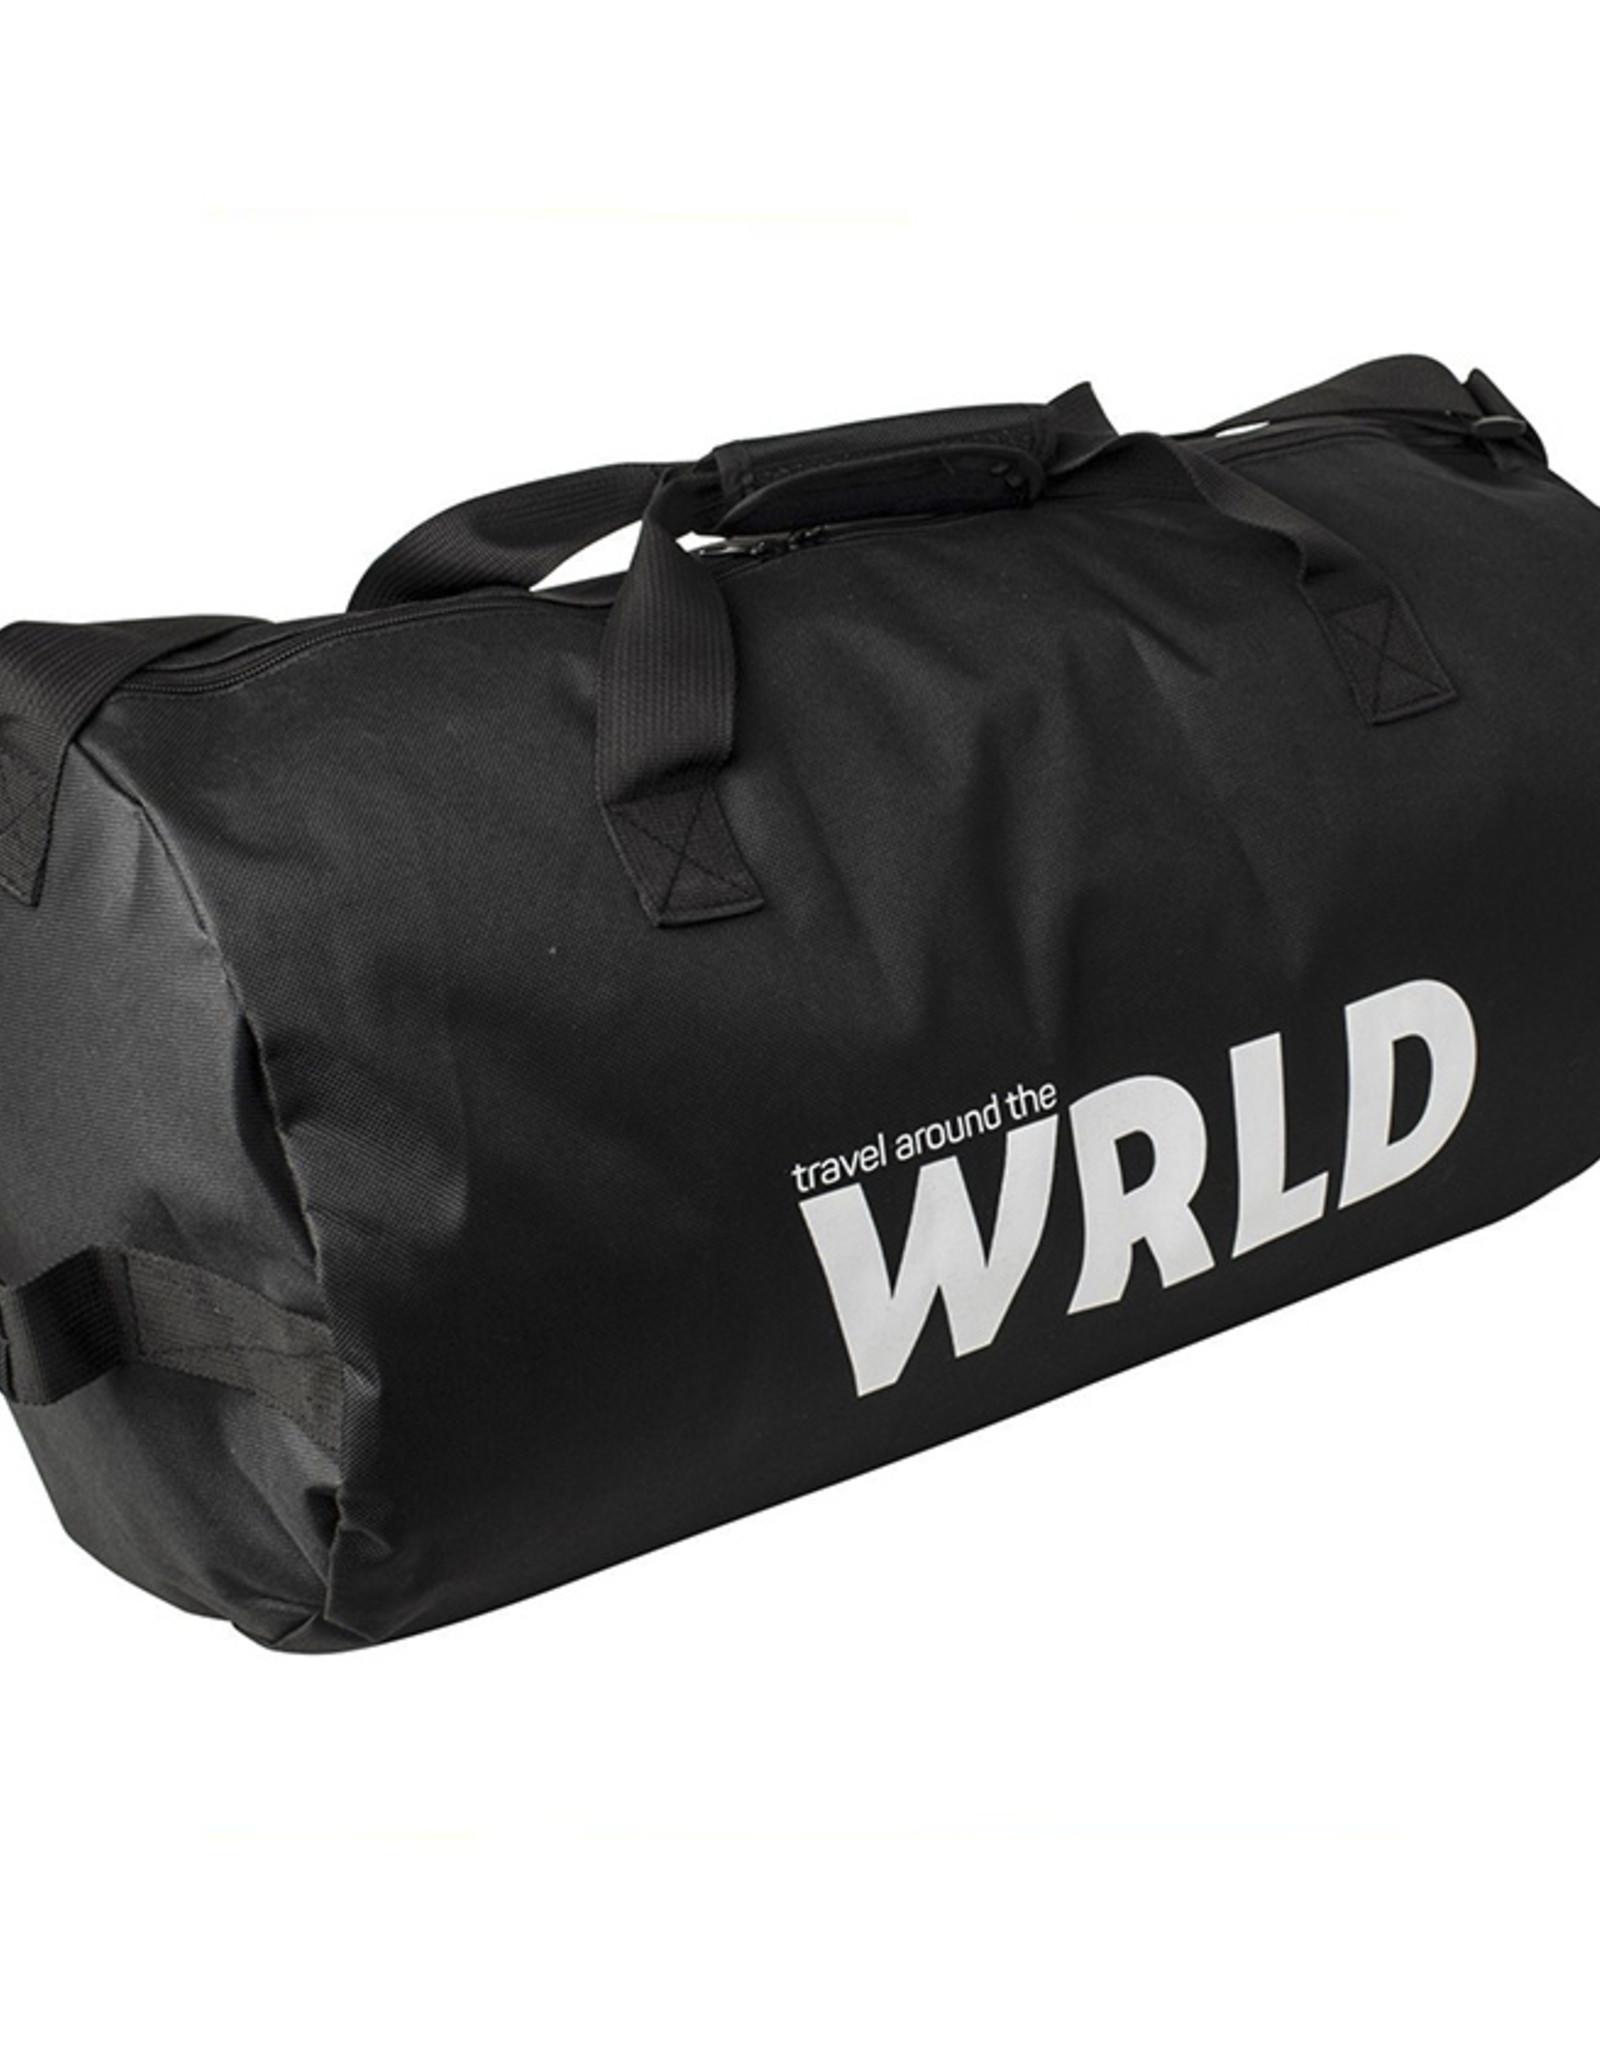 Weekendtas WRLD-black